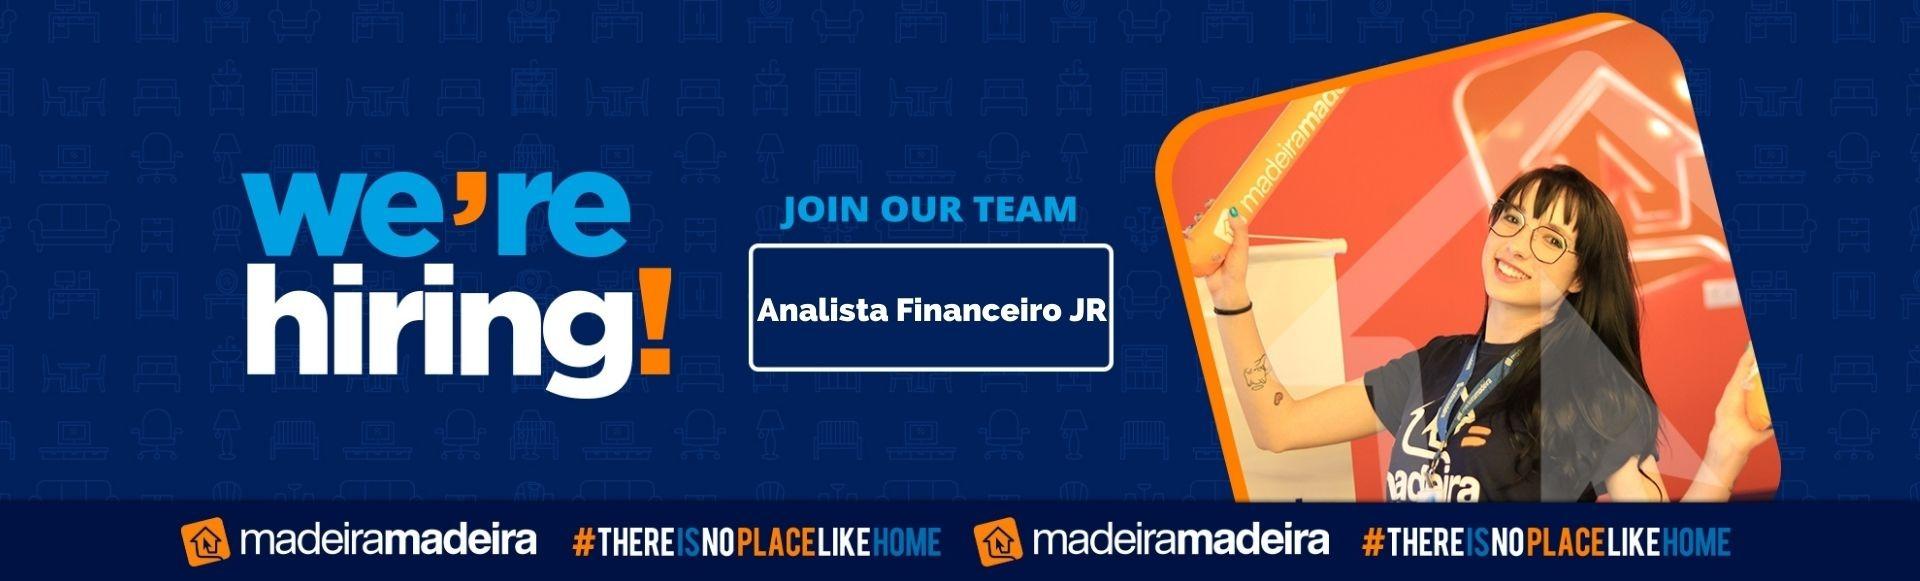 Analista Financeiro JR